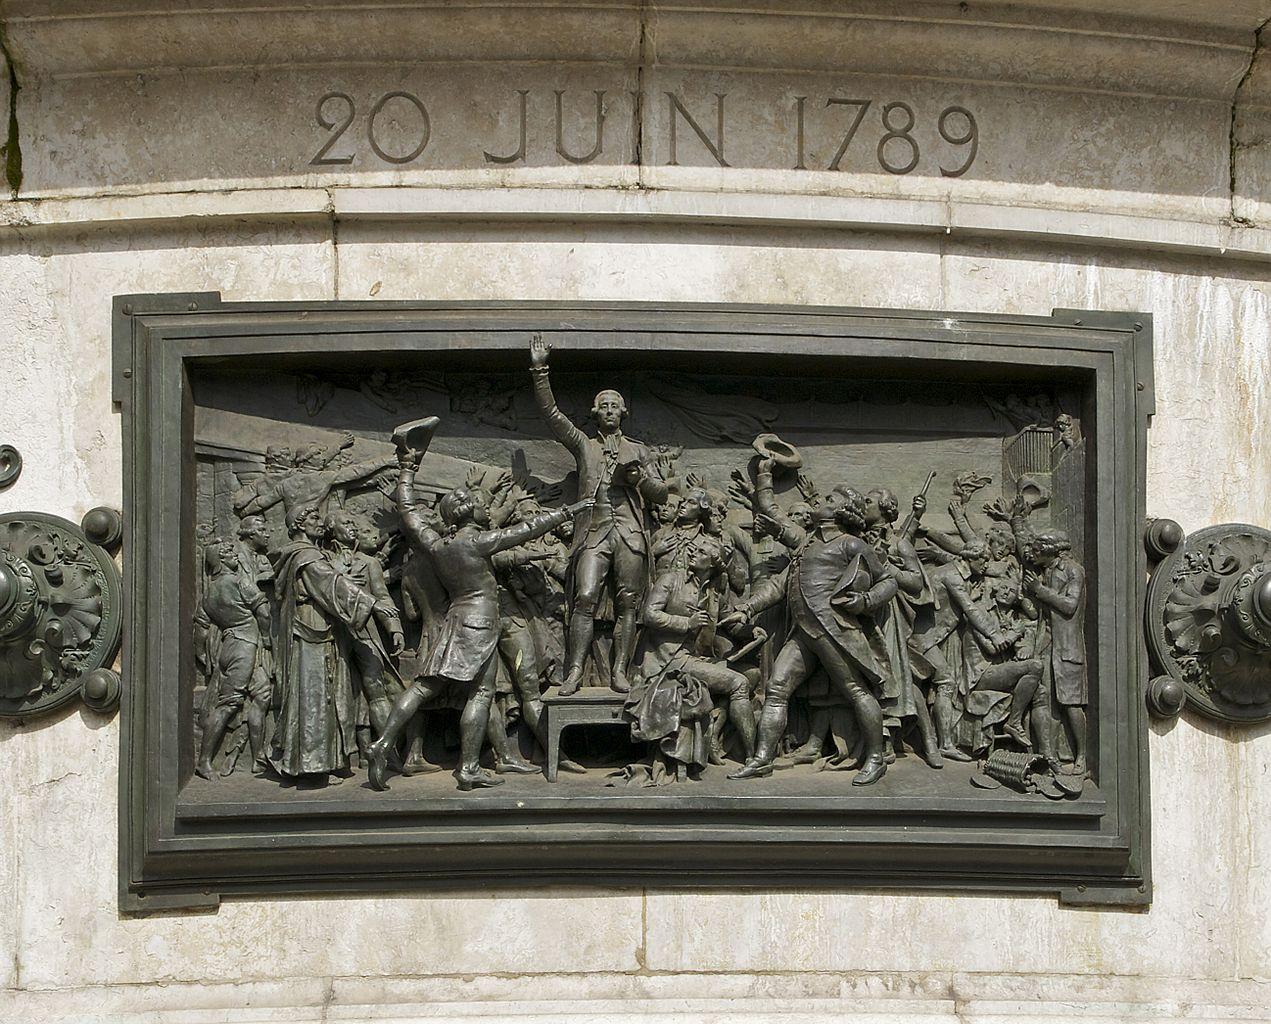 File:Serment jeu de Paume Tennis court oath 20 june 1789.jpg ...